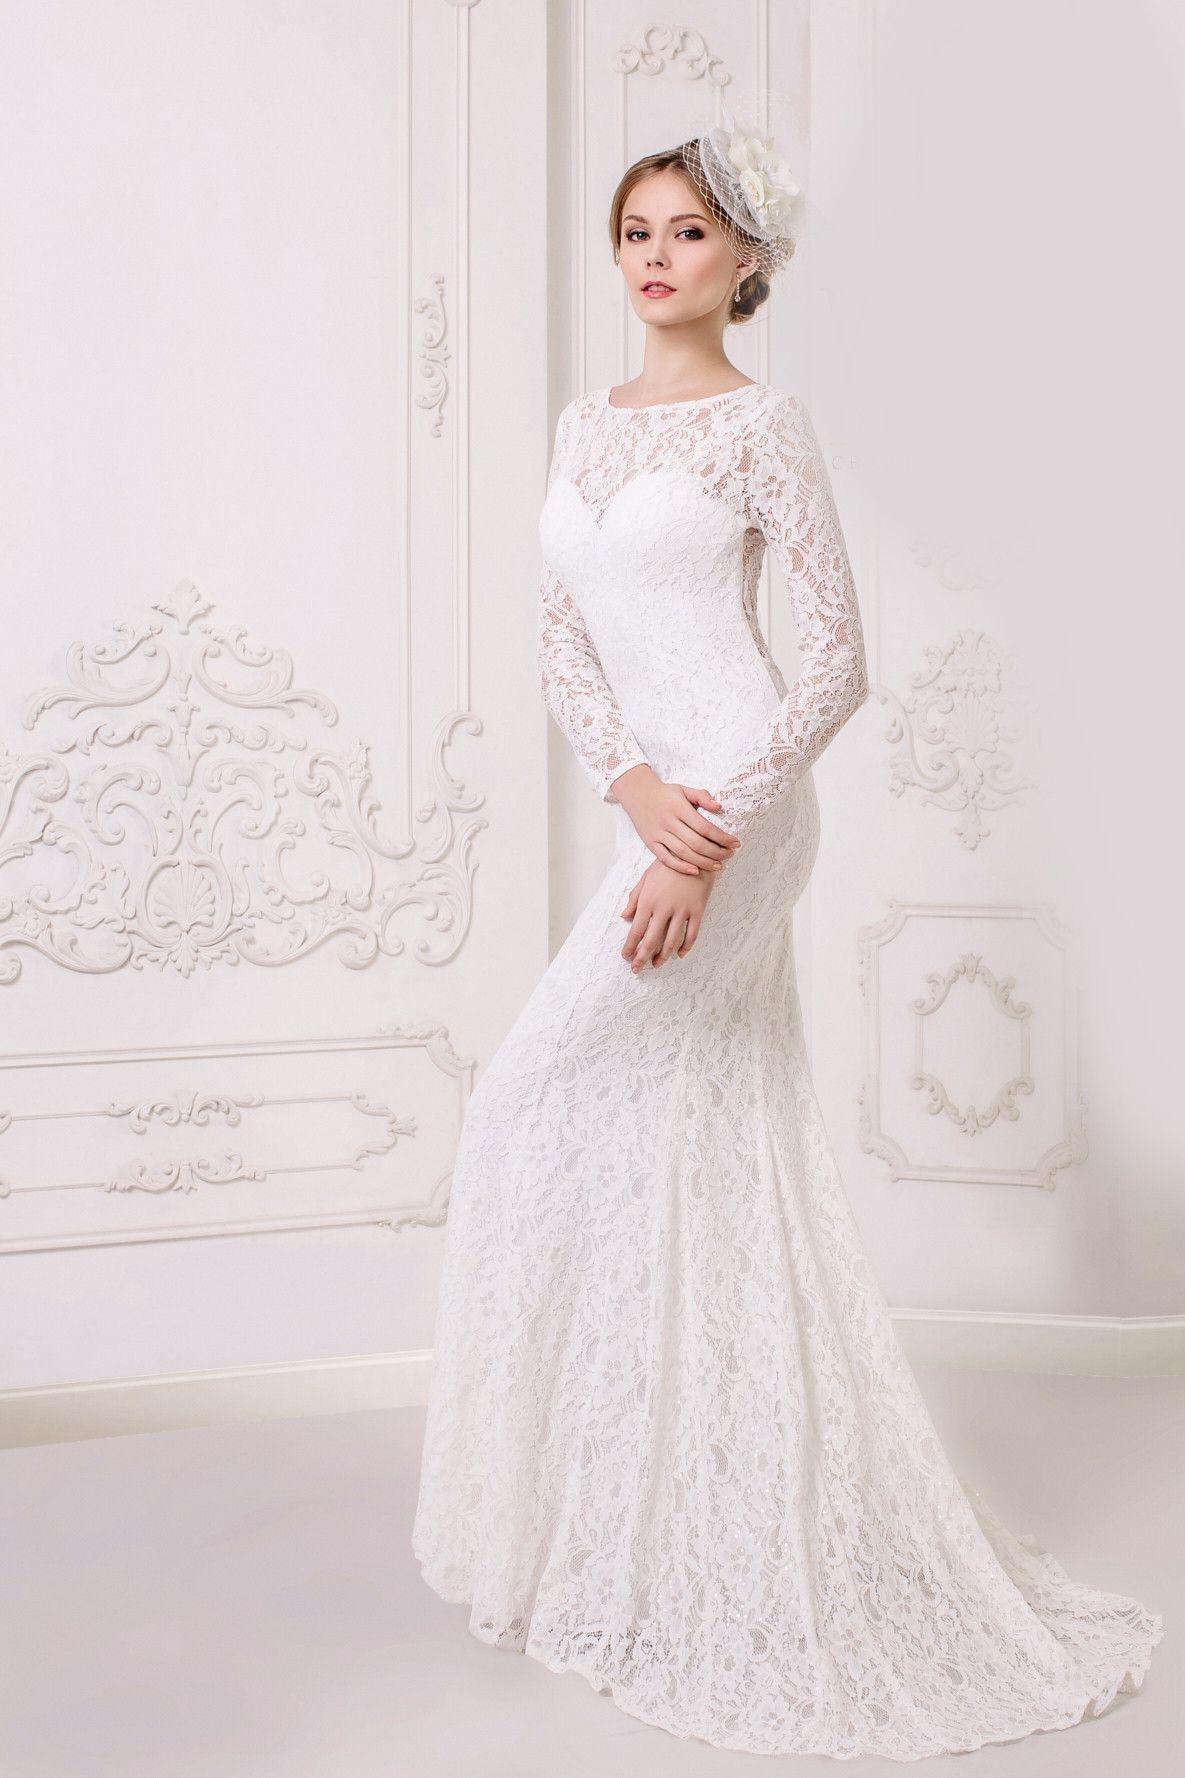 Long sleeve long lace maternity wedding dress wedding for Long sleeve lace maternity wedding dress